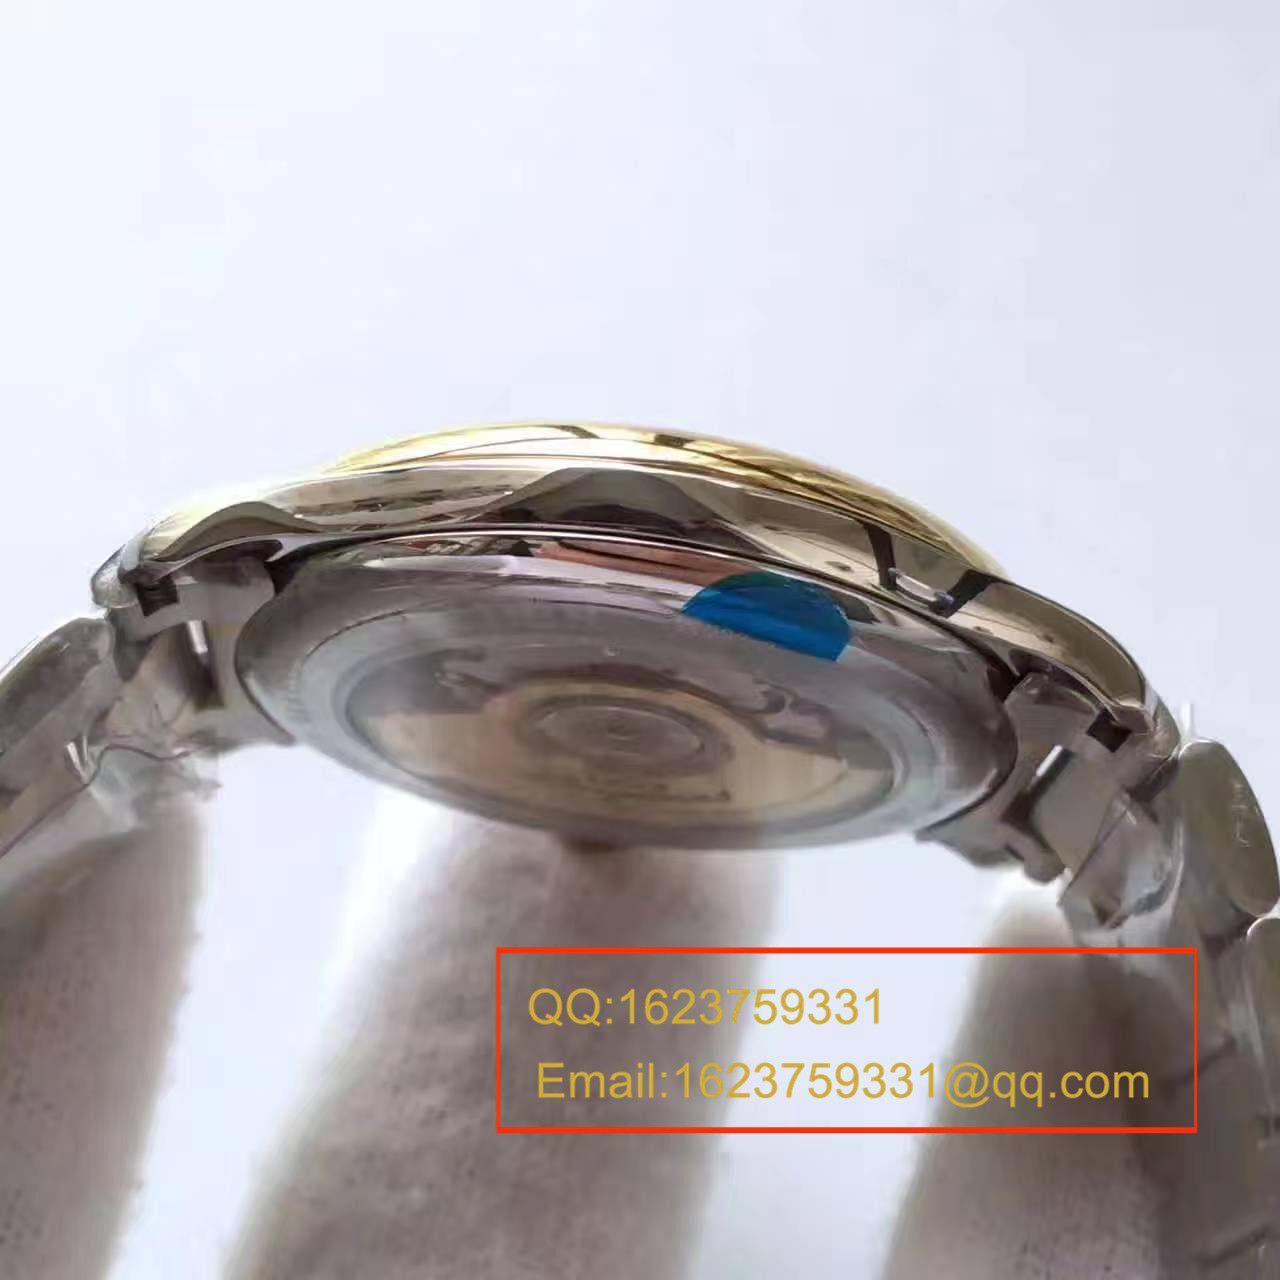 【MK复刻手表】浪琴制表传统系列L2.628.5.37.7腕表 / L078